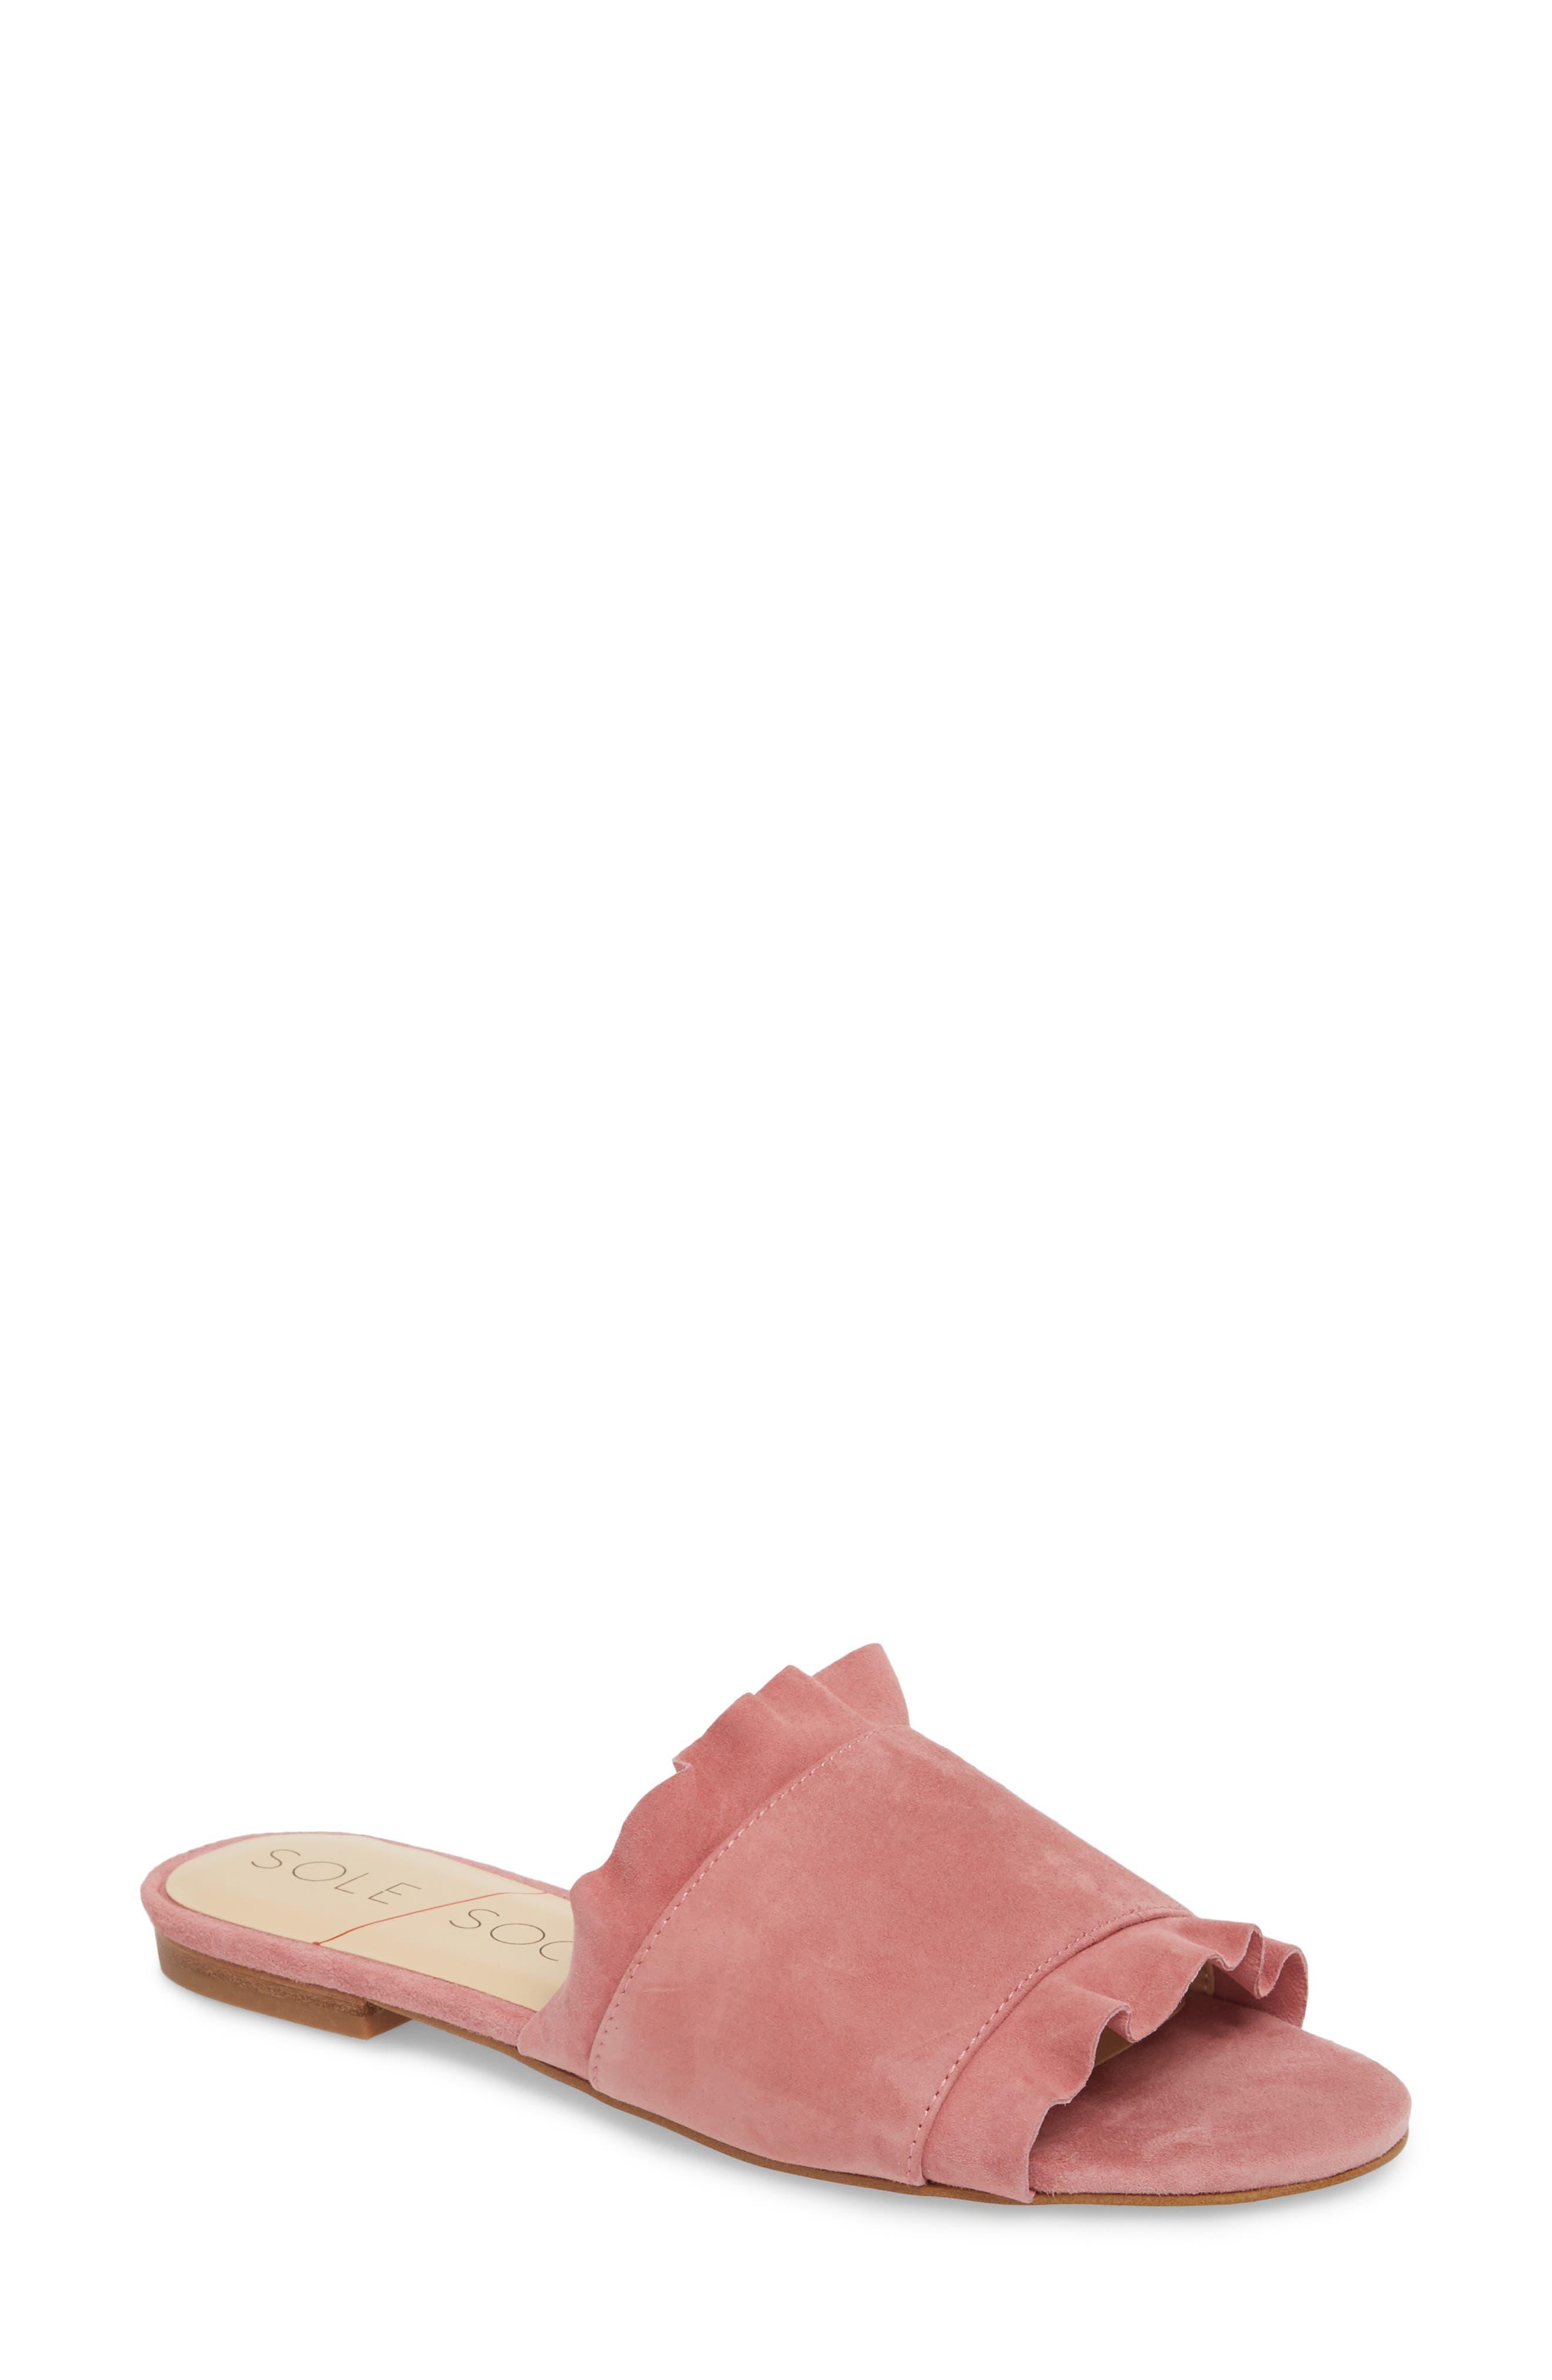 So-Madalayne Flat Sandal,                             Main thumbnail 1, color,                             658